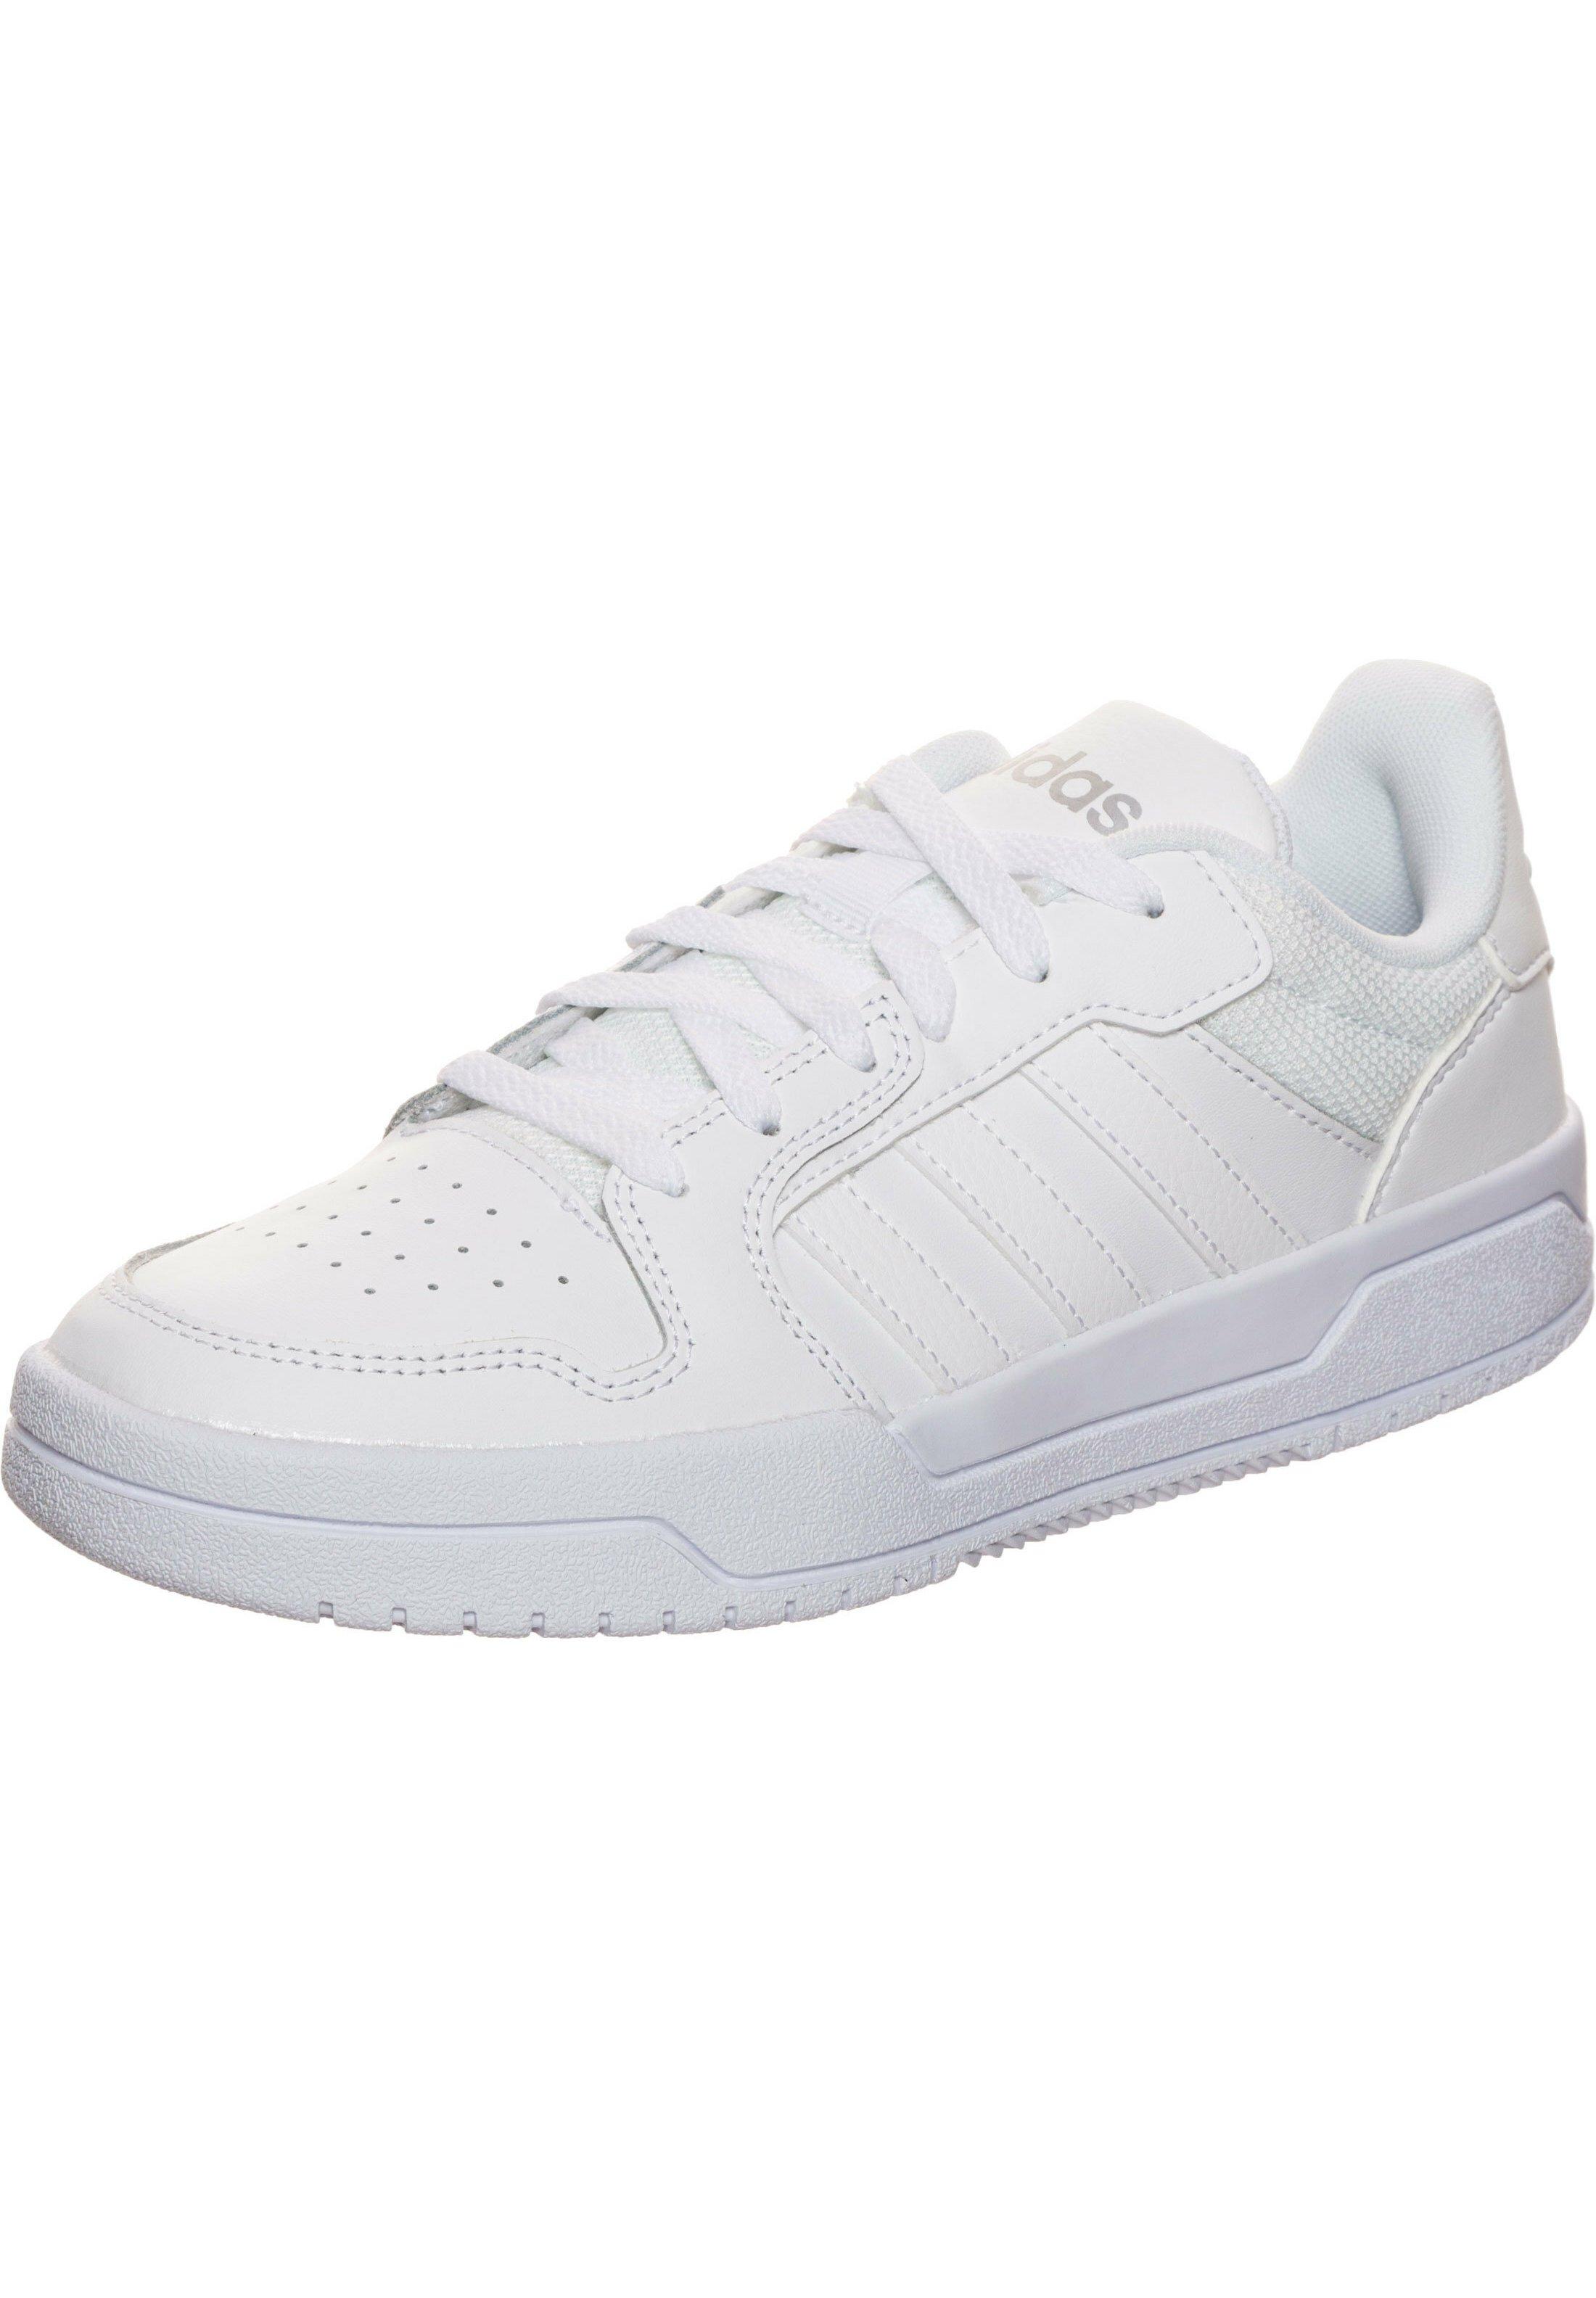 Adidas Performance Entrap - Chaussures De Basket White/metallic Silver